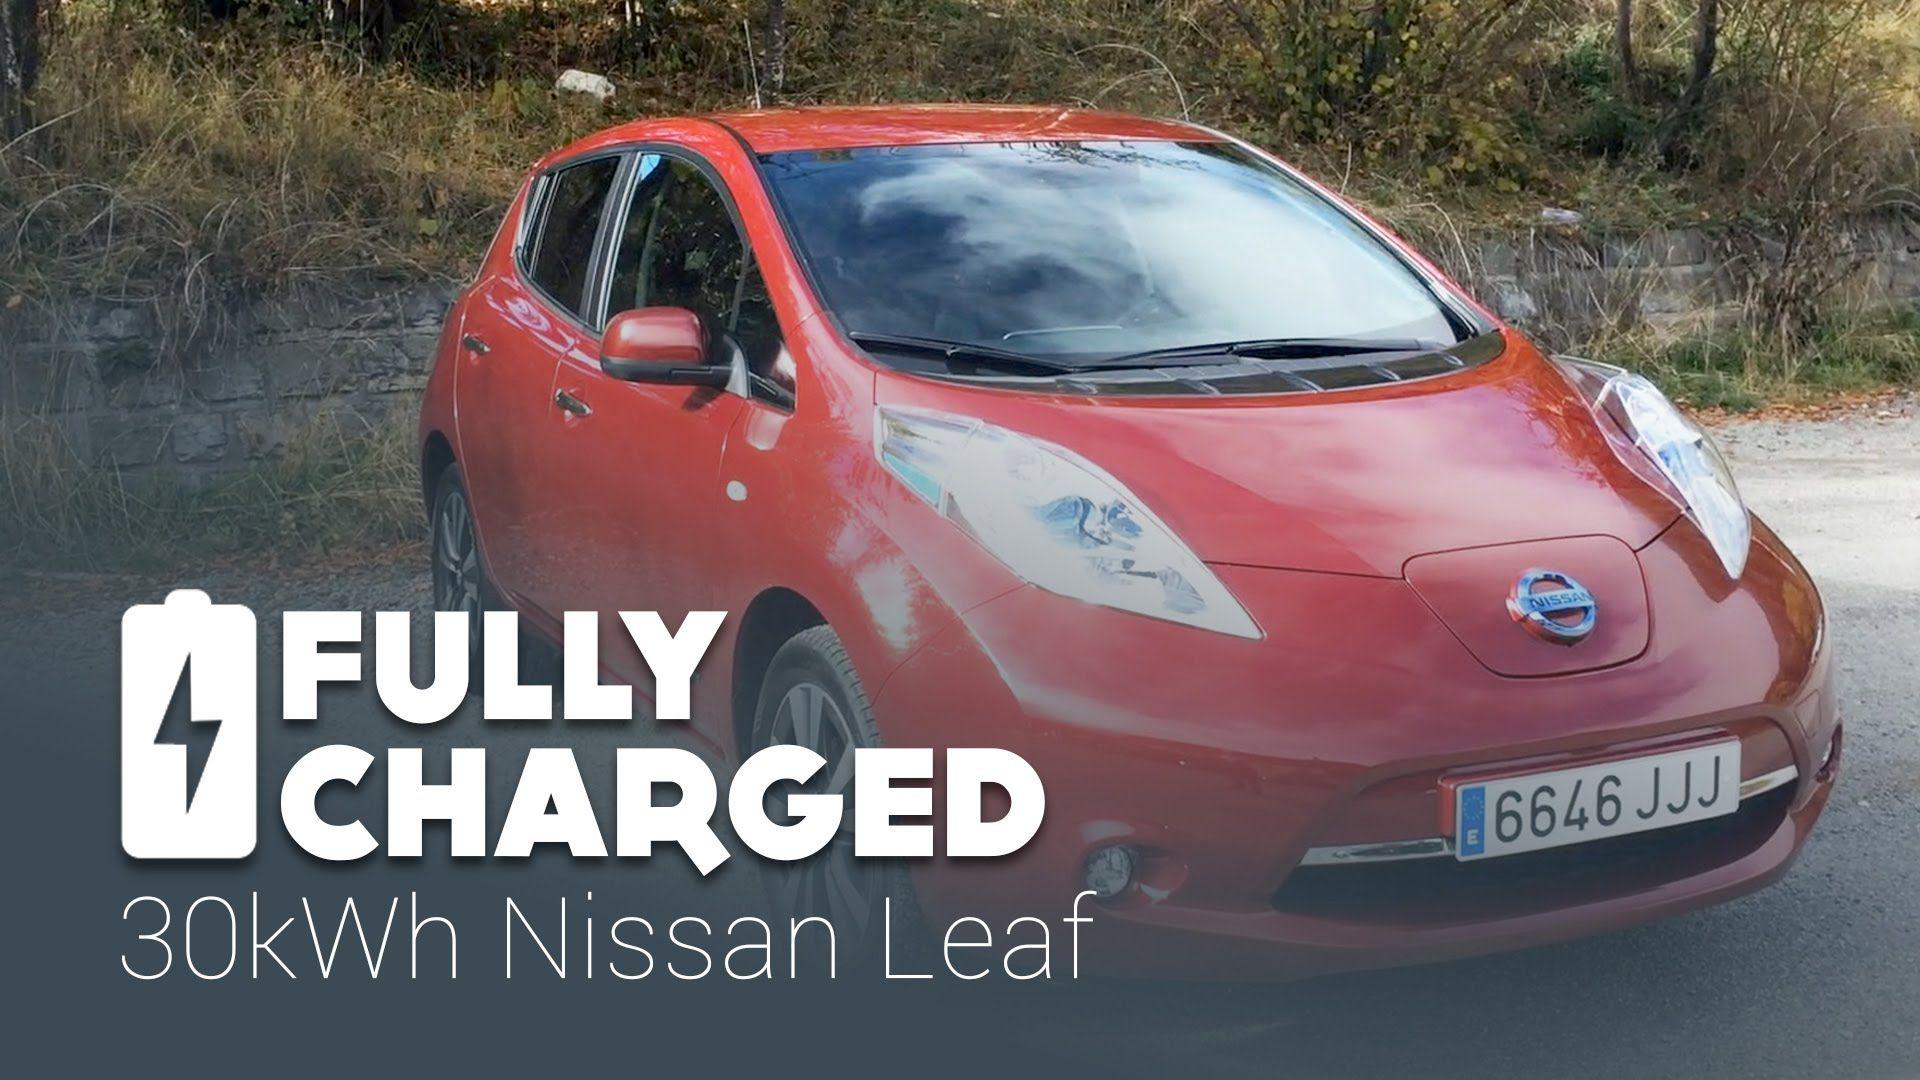 Longer Range 30kwh Nissan Leaf Fully Charged Nissan Leaf Nissan Car Videos